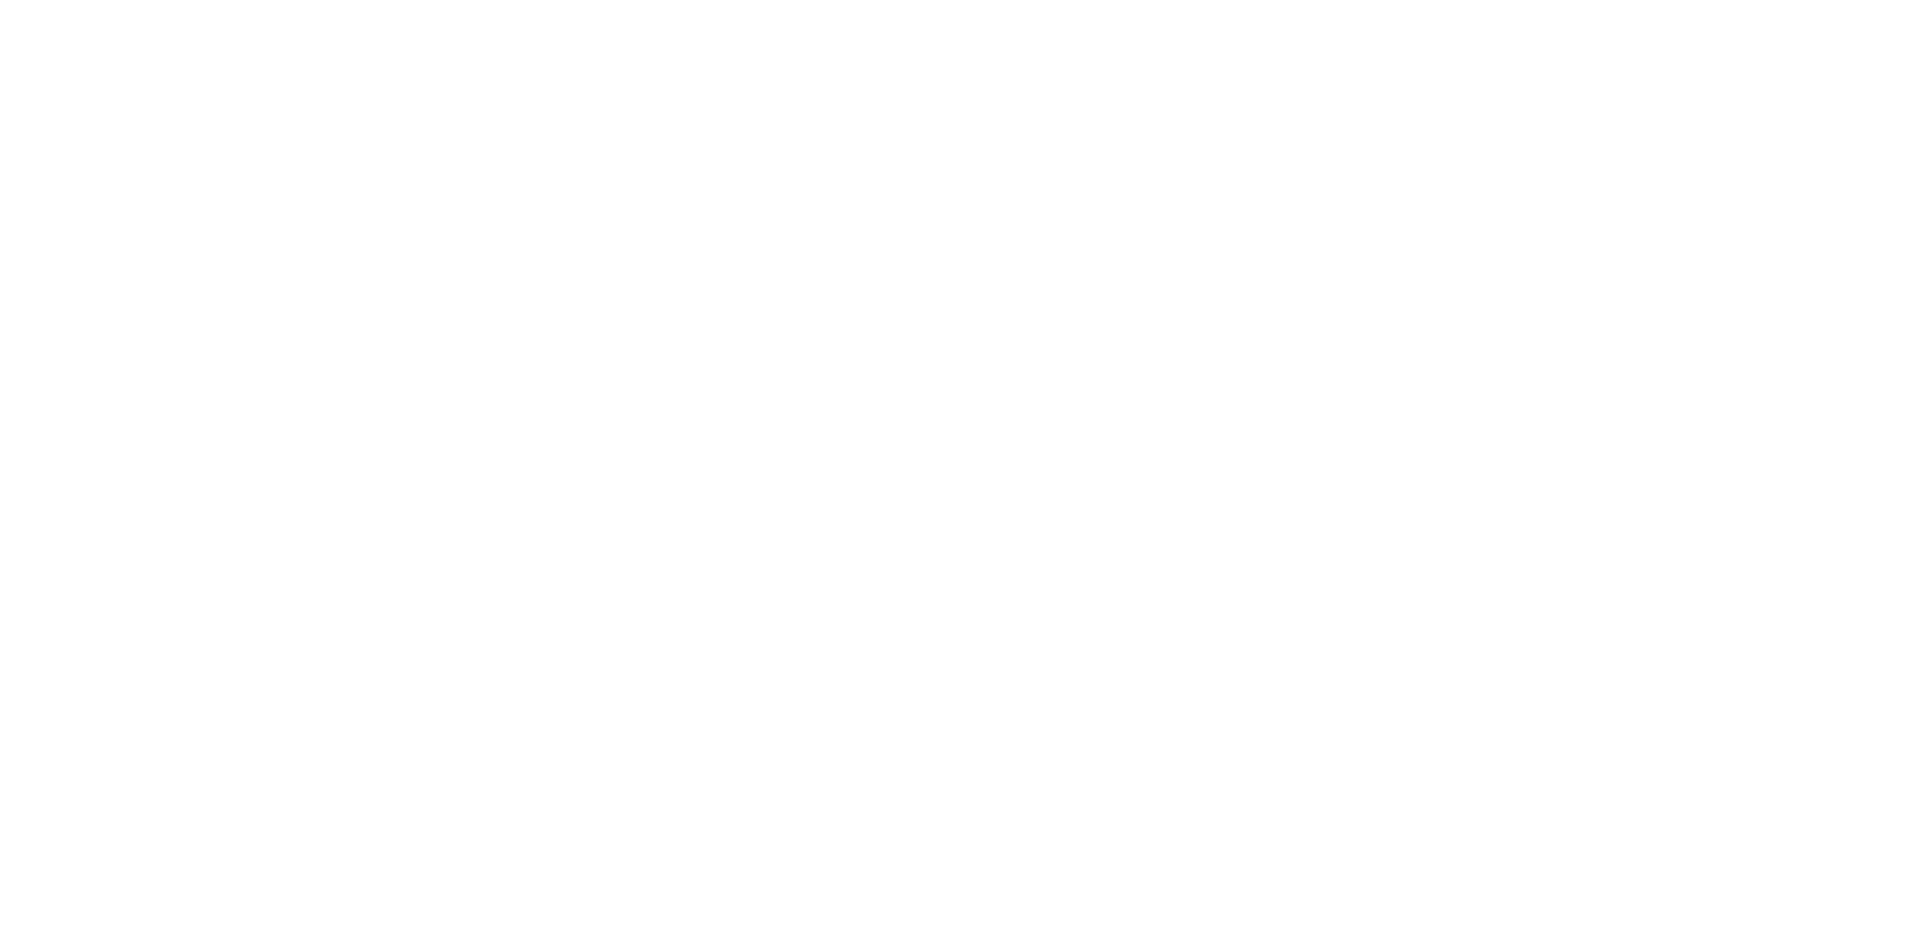 Fireface UCX, la nueva interfaz de alto nivel de RME